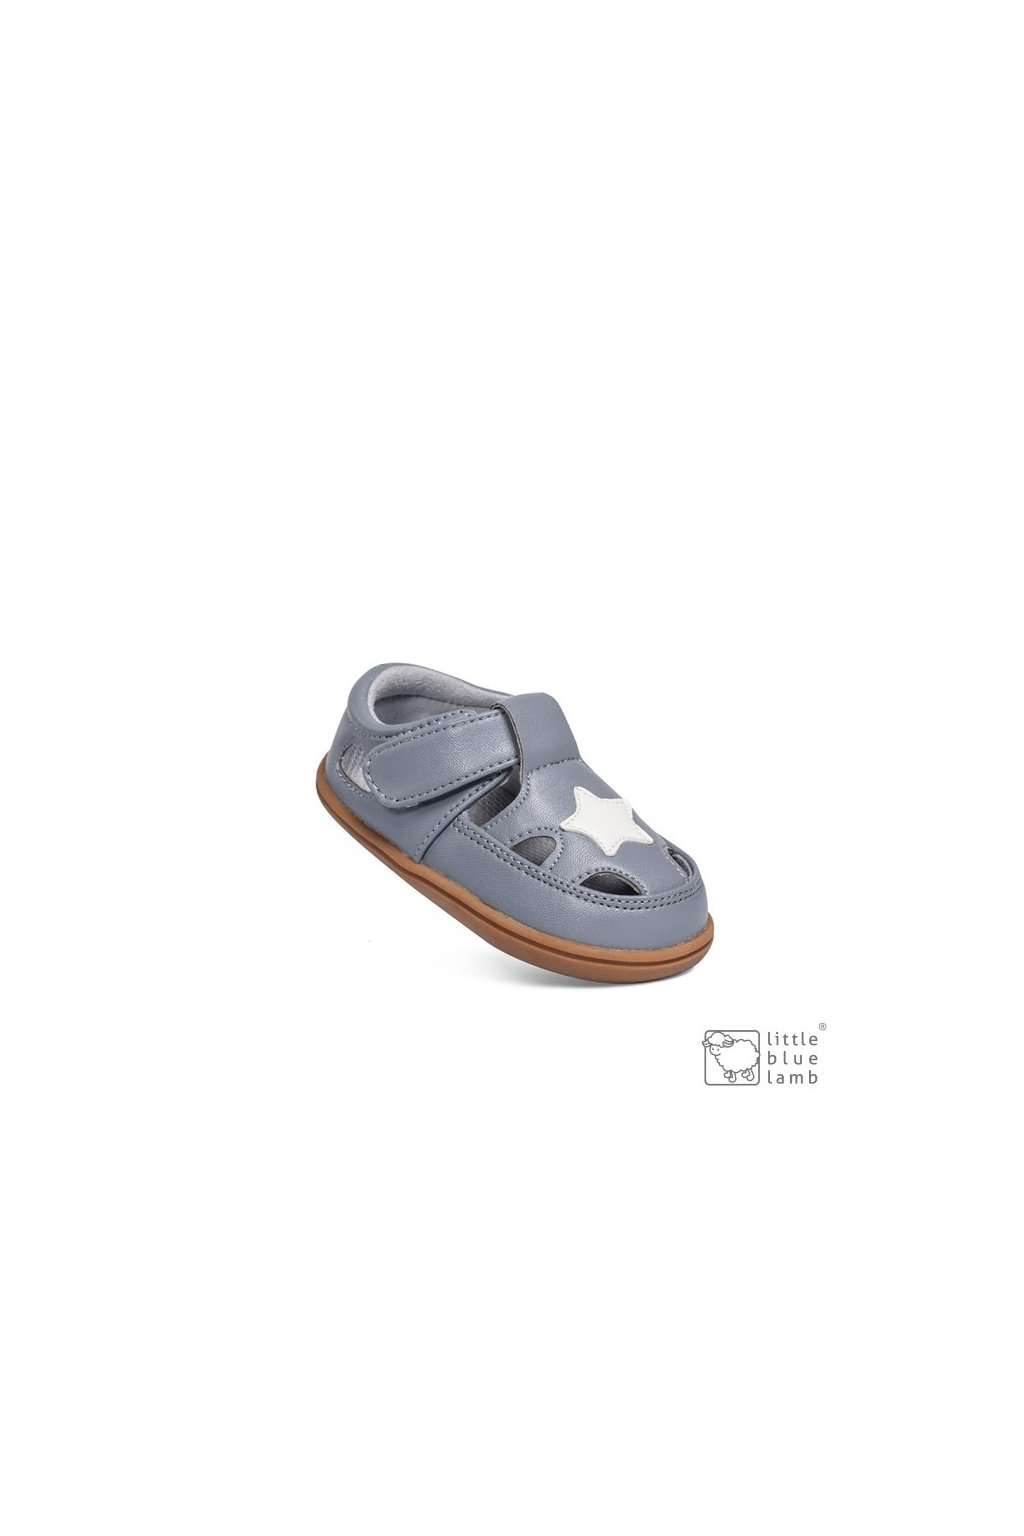 LBL Basty Grey